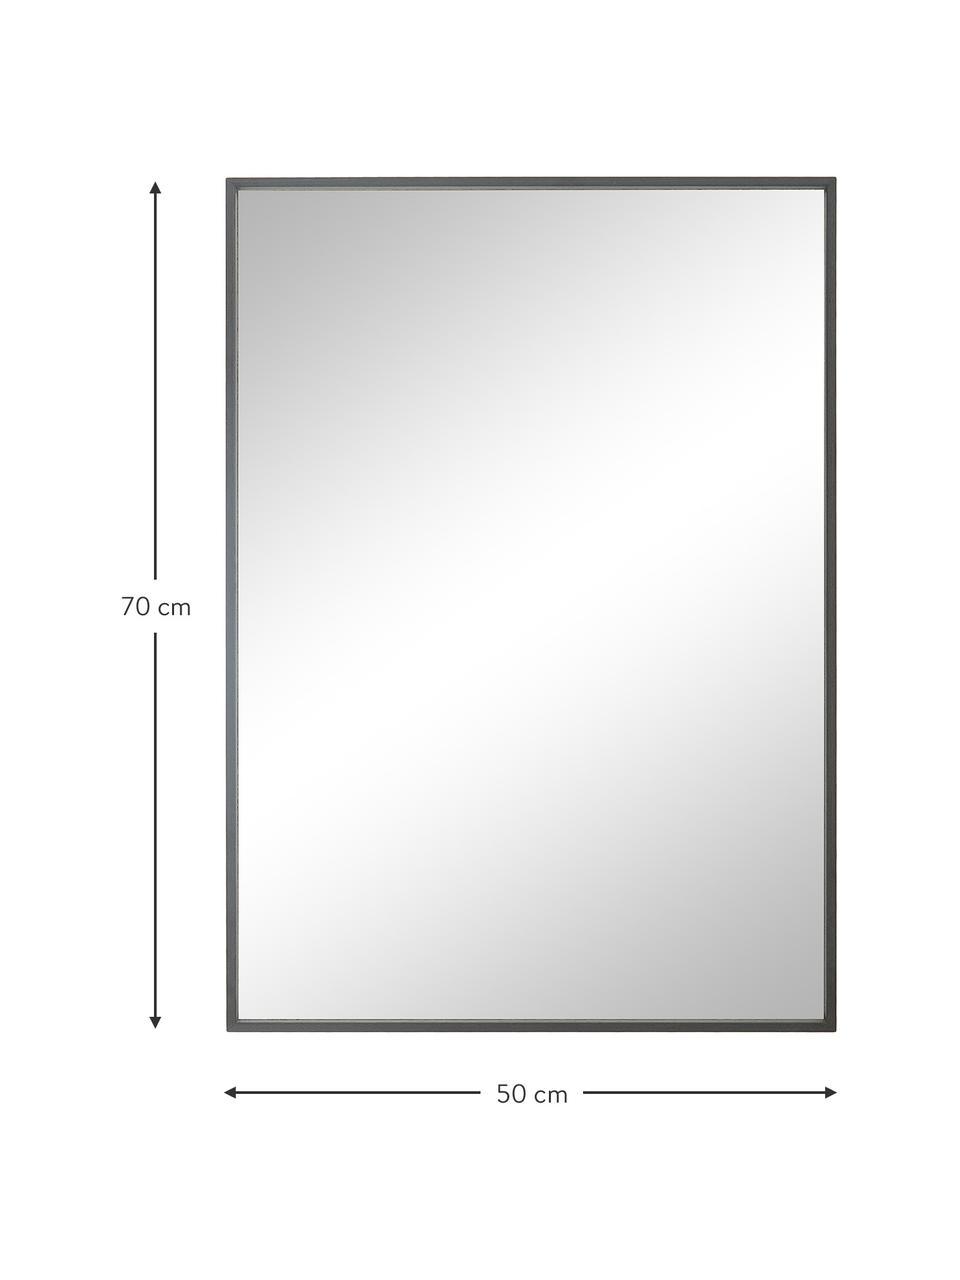 Eckiger Wandspiegel Alpha mit grauem Aluminiumrahmen, Rahmen: Aluminium, beschichtet, Spiegelfläche: Spiegelglas, Grau, 50 x 70 cm